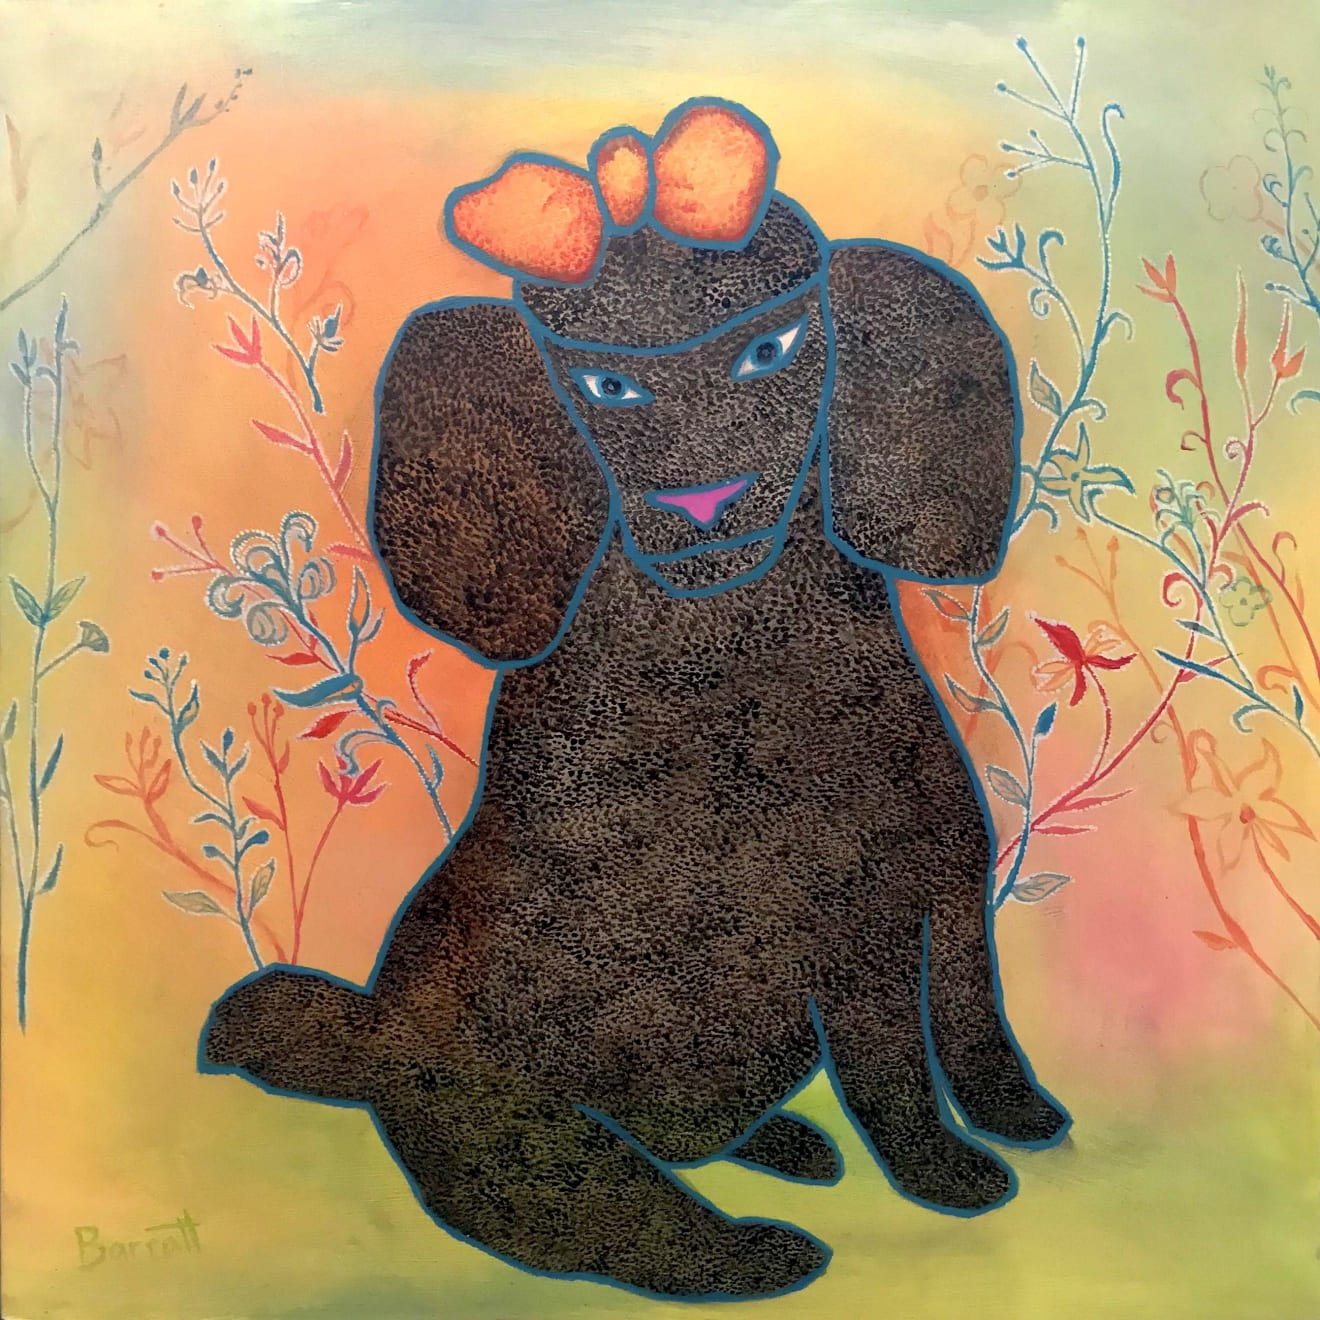 Summer Auction 2020, LOT 08 - Mychael Barratt - 'Chris Ofili's Dog', 2016